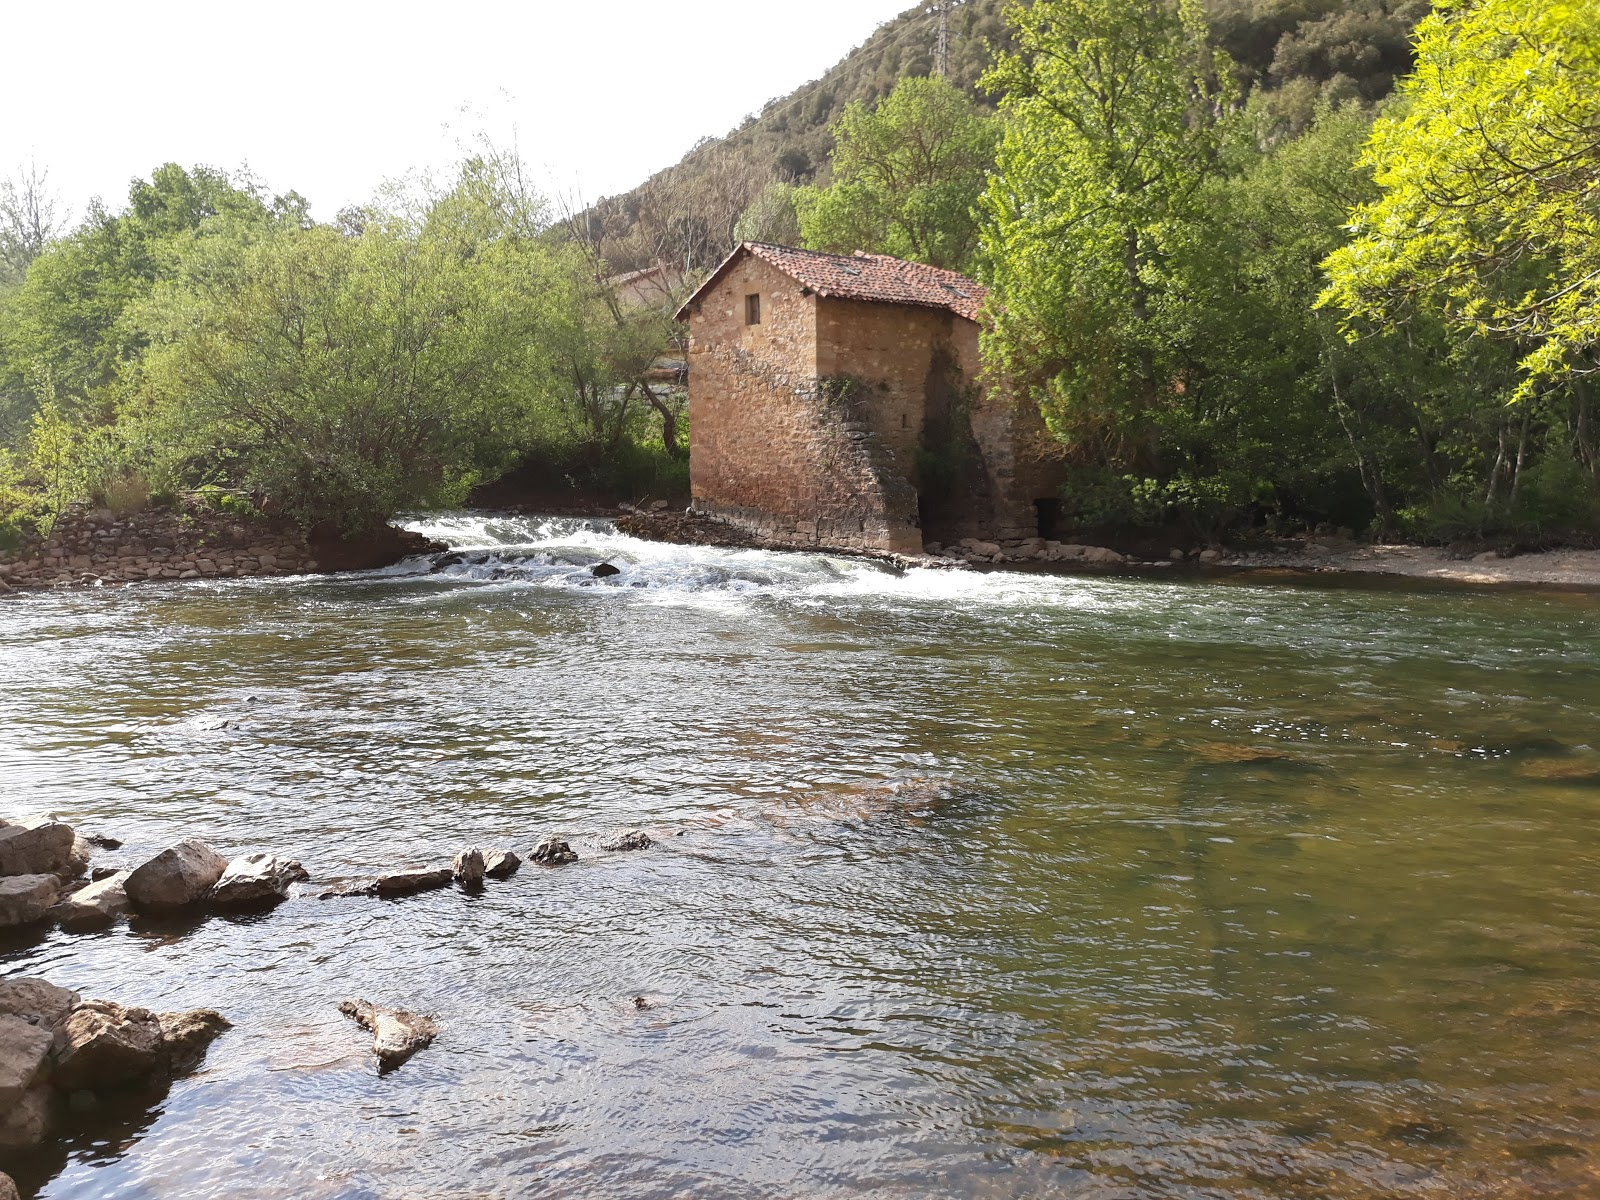 Tubilleja de Ebro